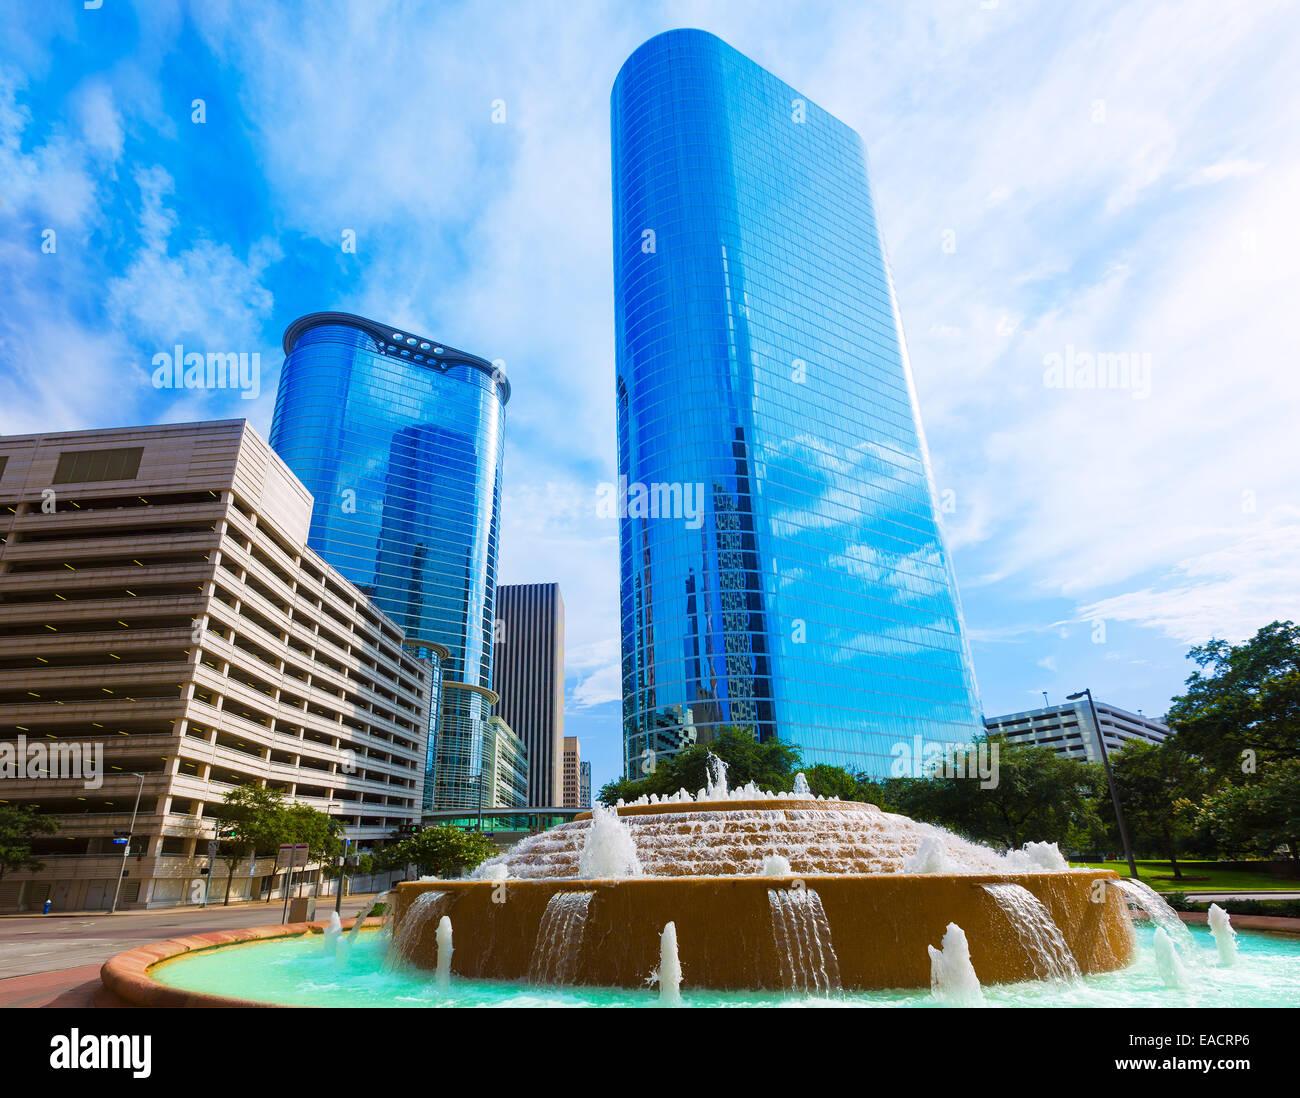 Bob and Vivian Smith fountain in Houston downtown Texas US - Stock Image